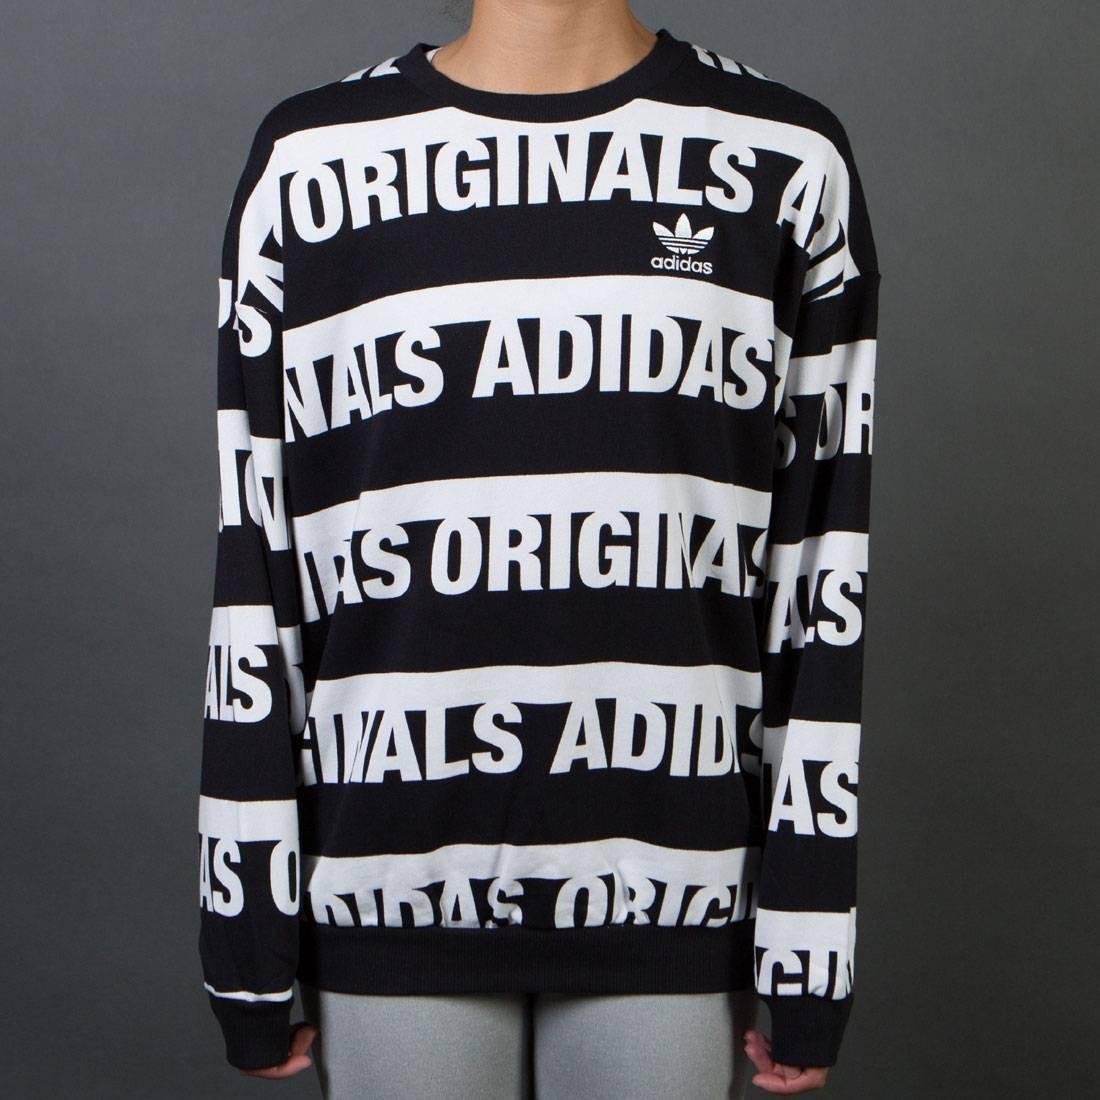 adidas Originals adidas Originals Trefoil Crew Sweatshirt (Black) Women's Sweatshirt from Zappos   ShapeShop